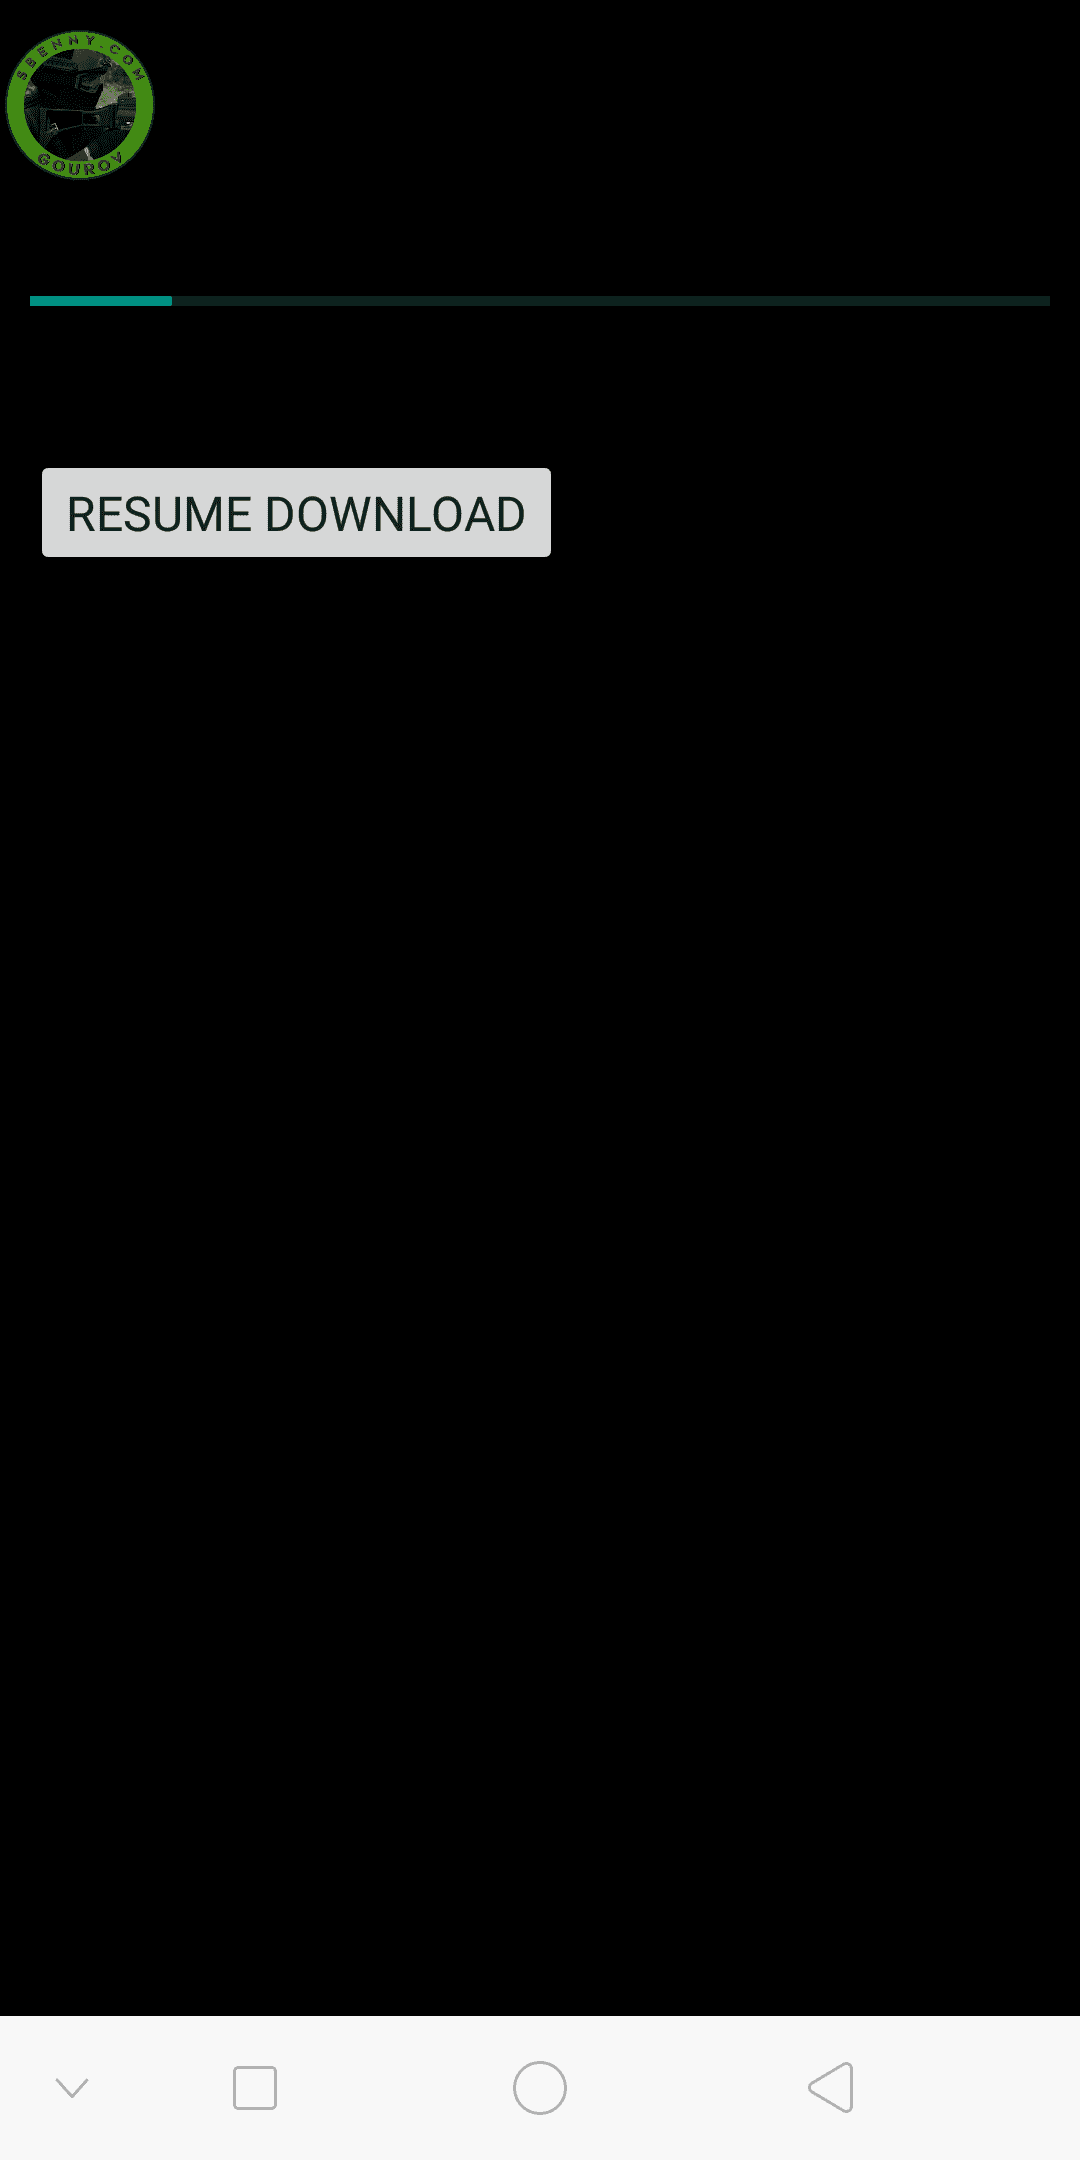 Screenshot_2021-06-14-14-12-19-58.png